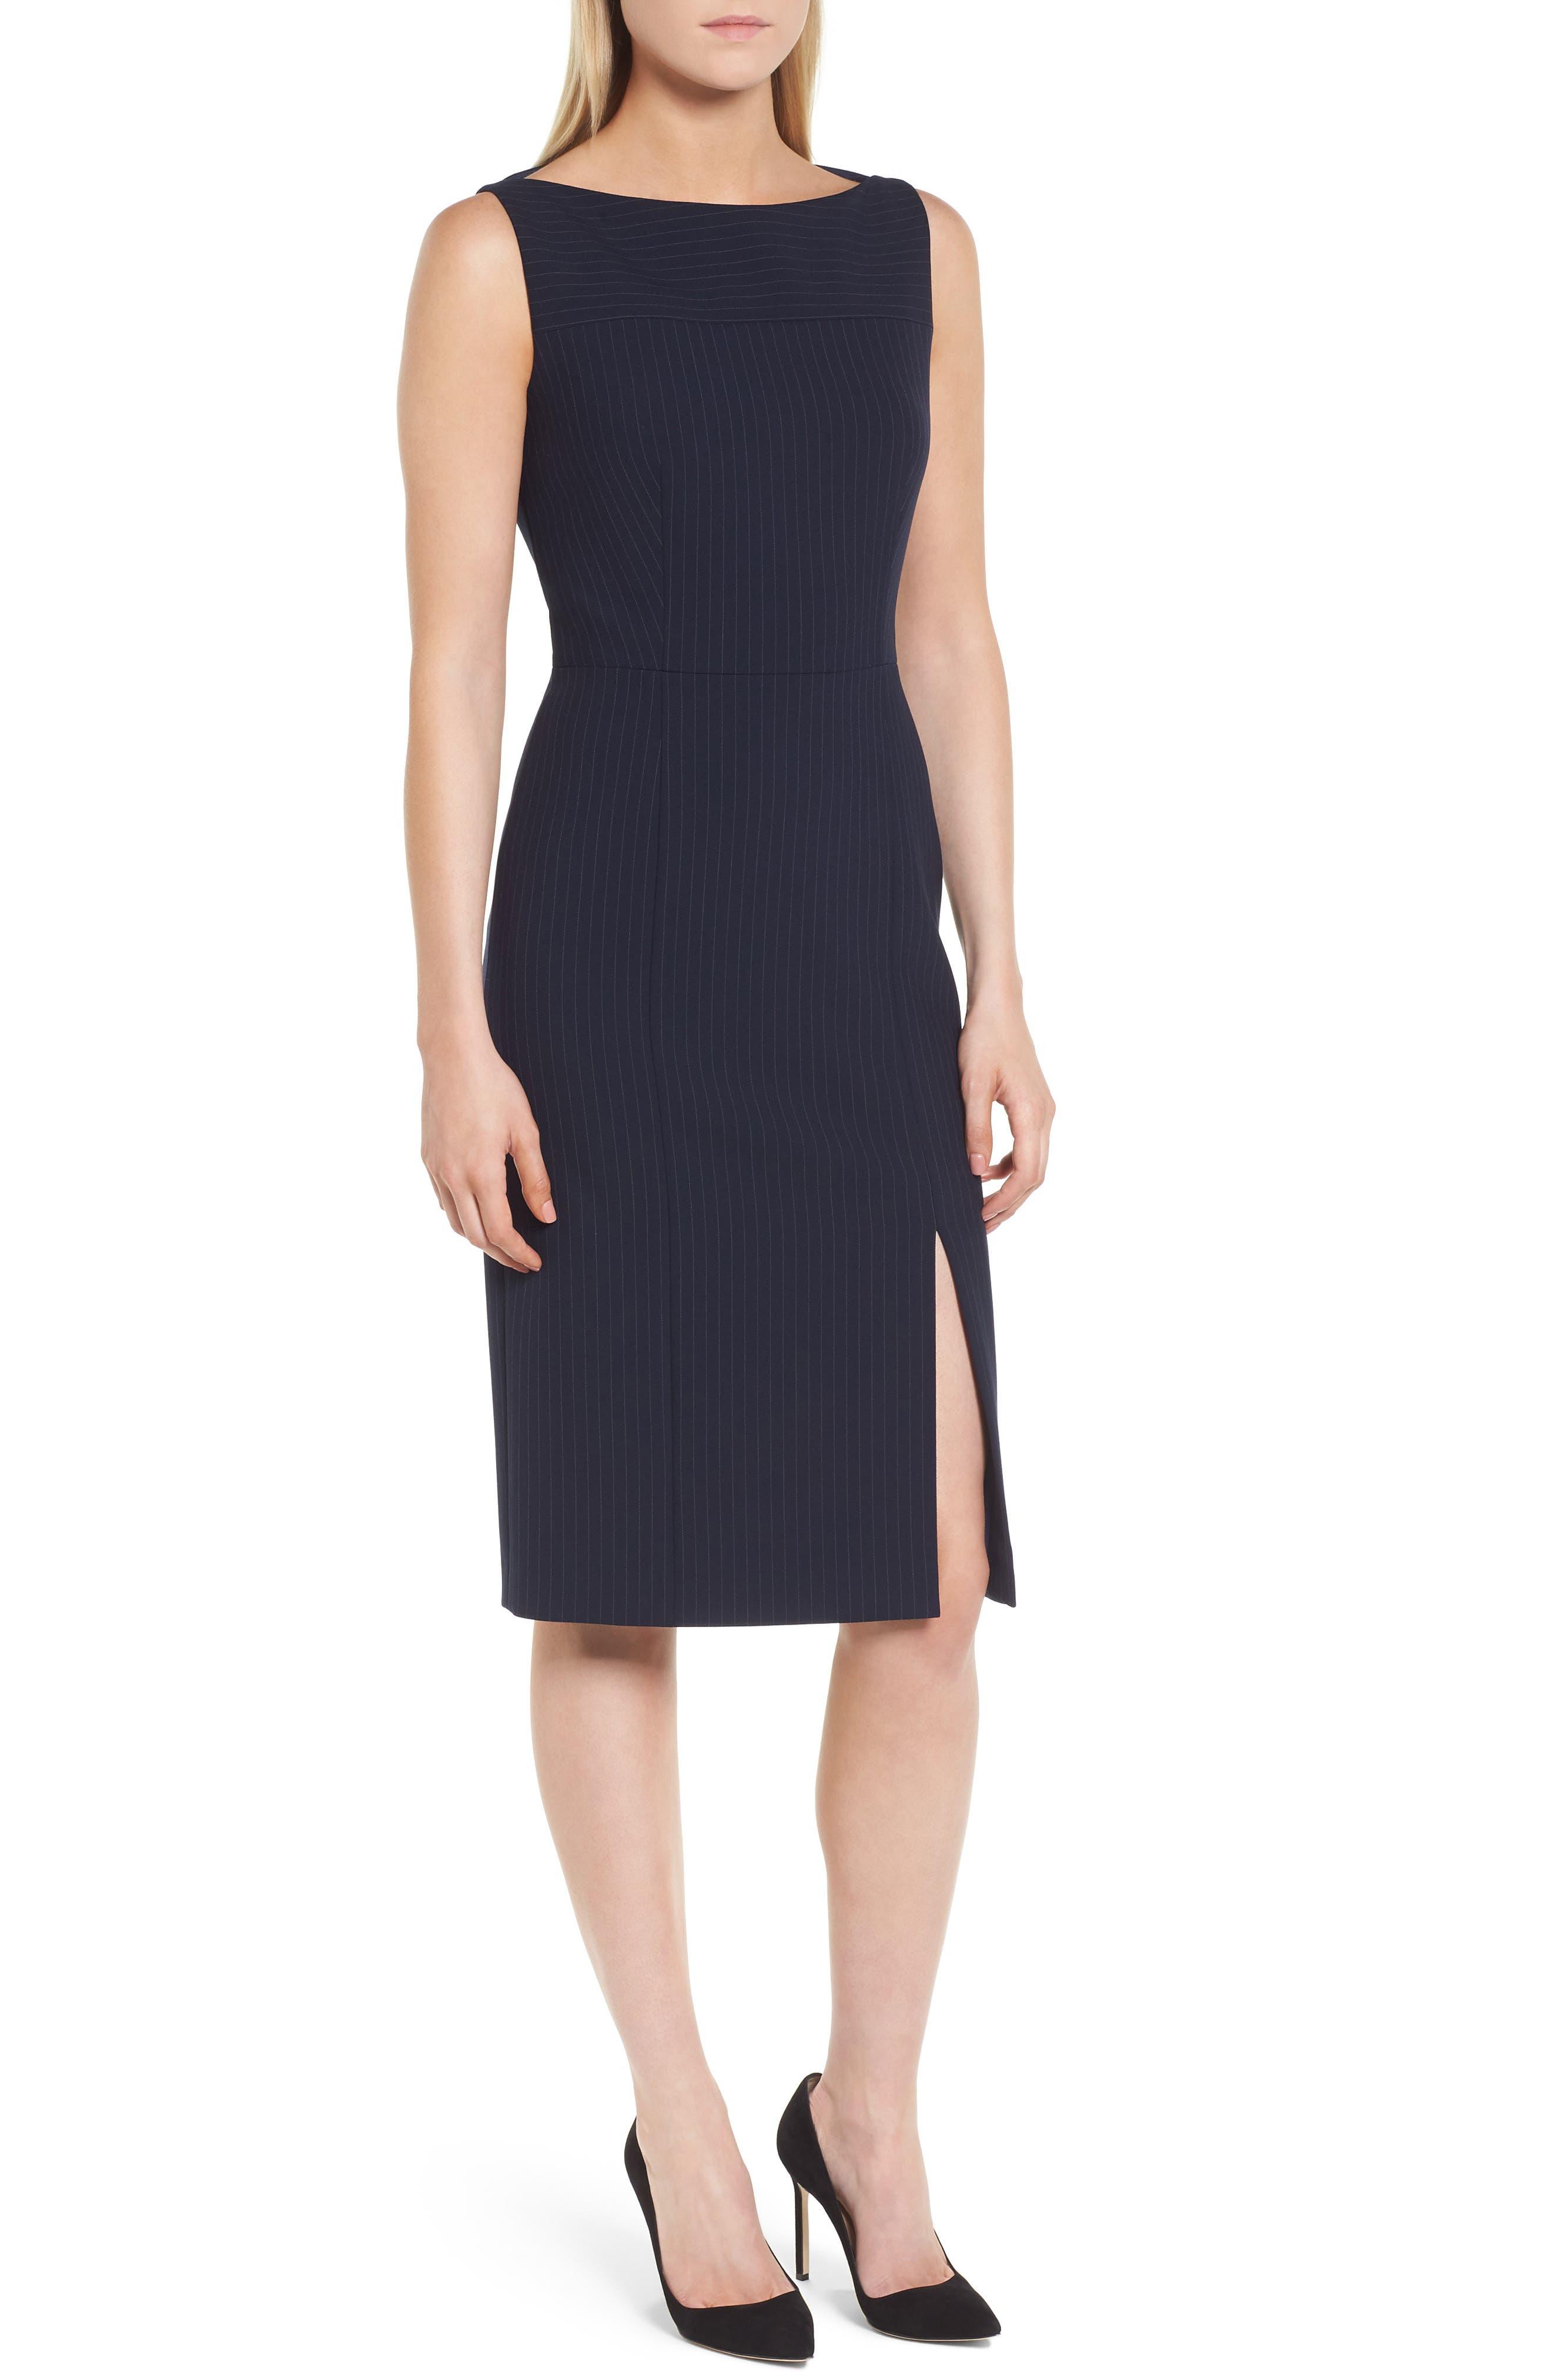 Denaka Pinstripe Sheath Dress,                         Main,                         color,